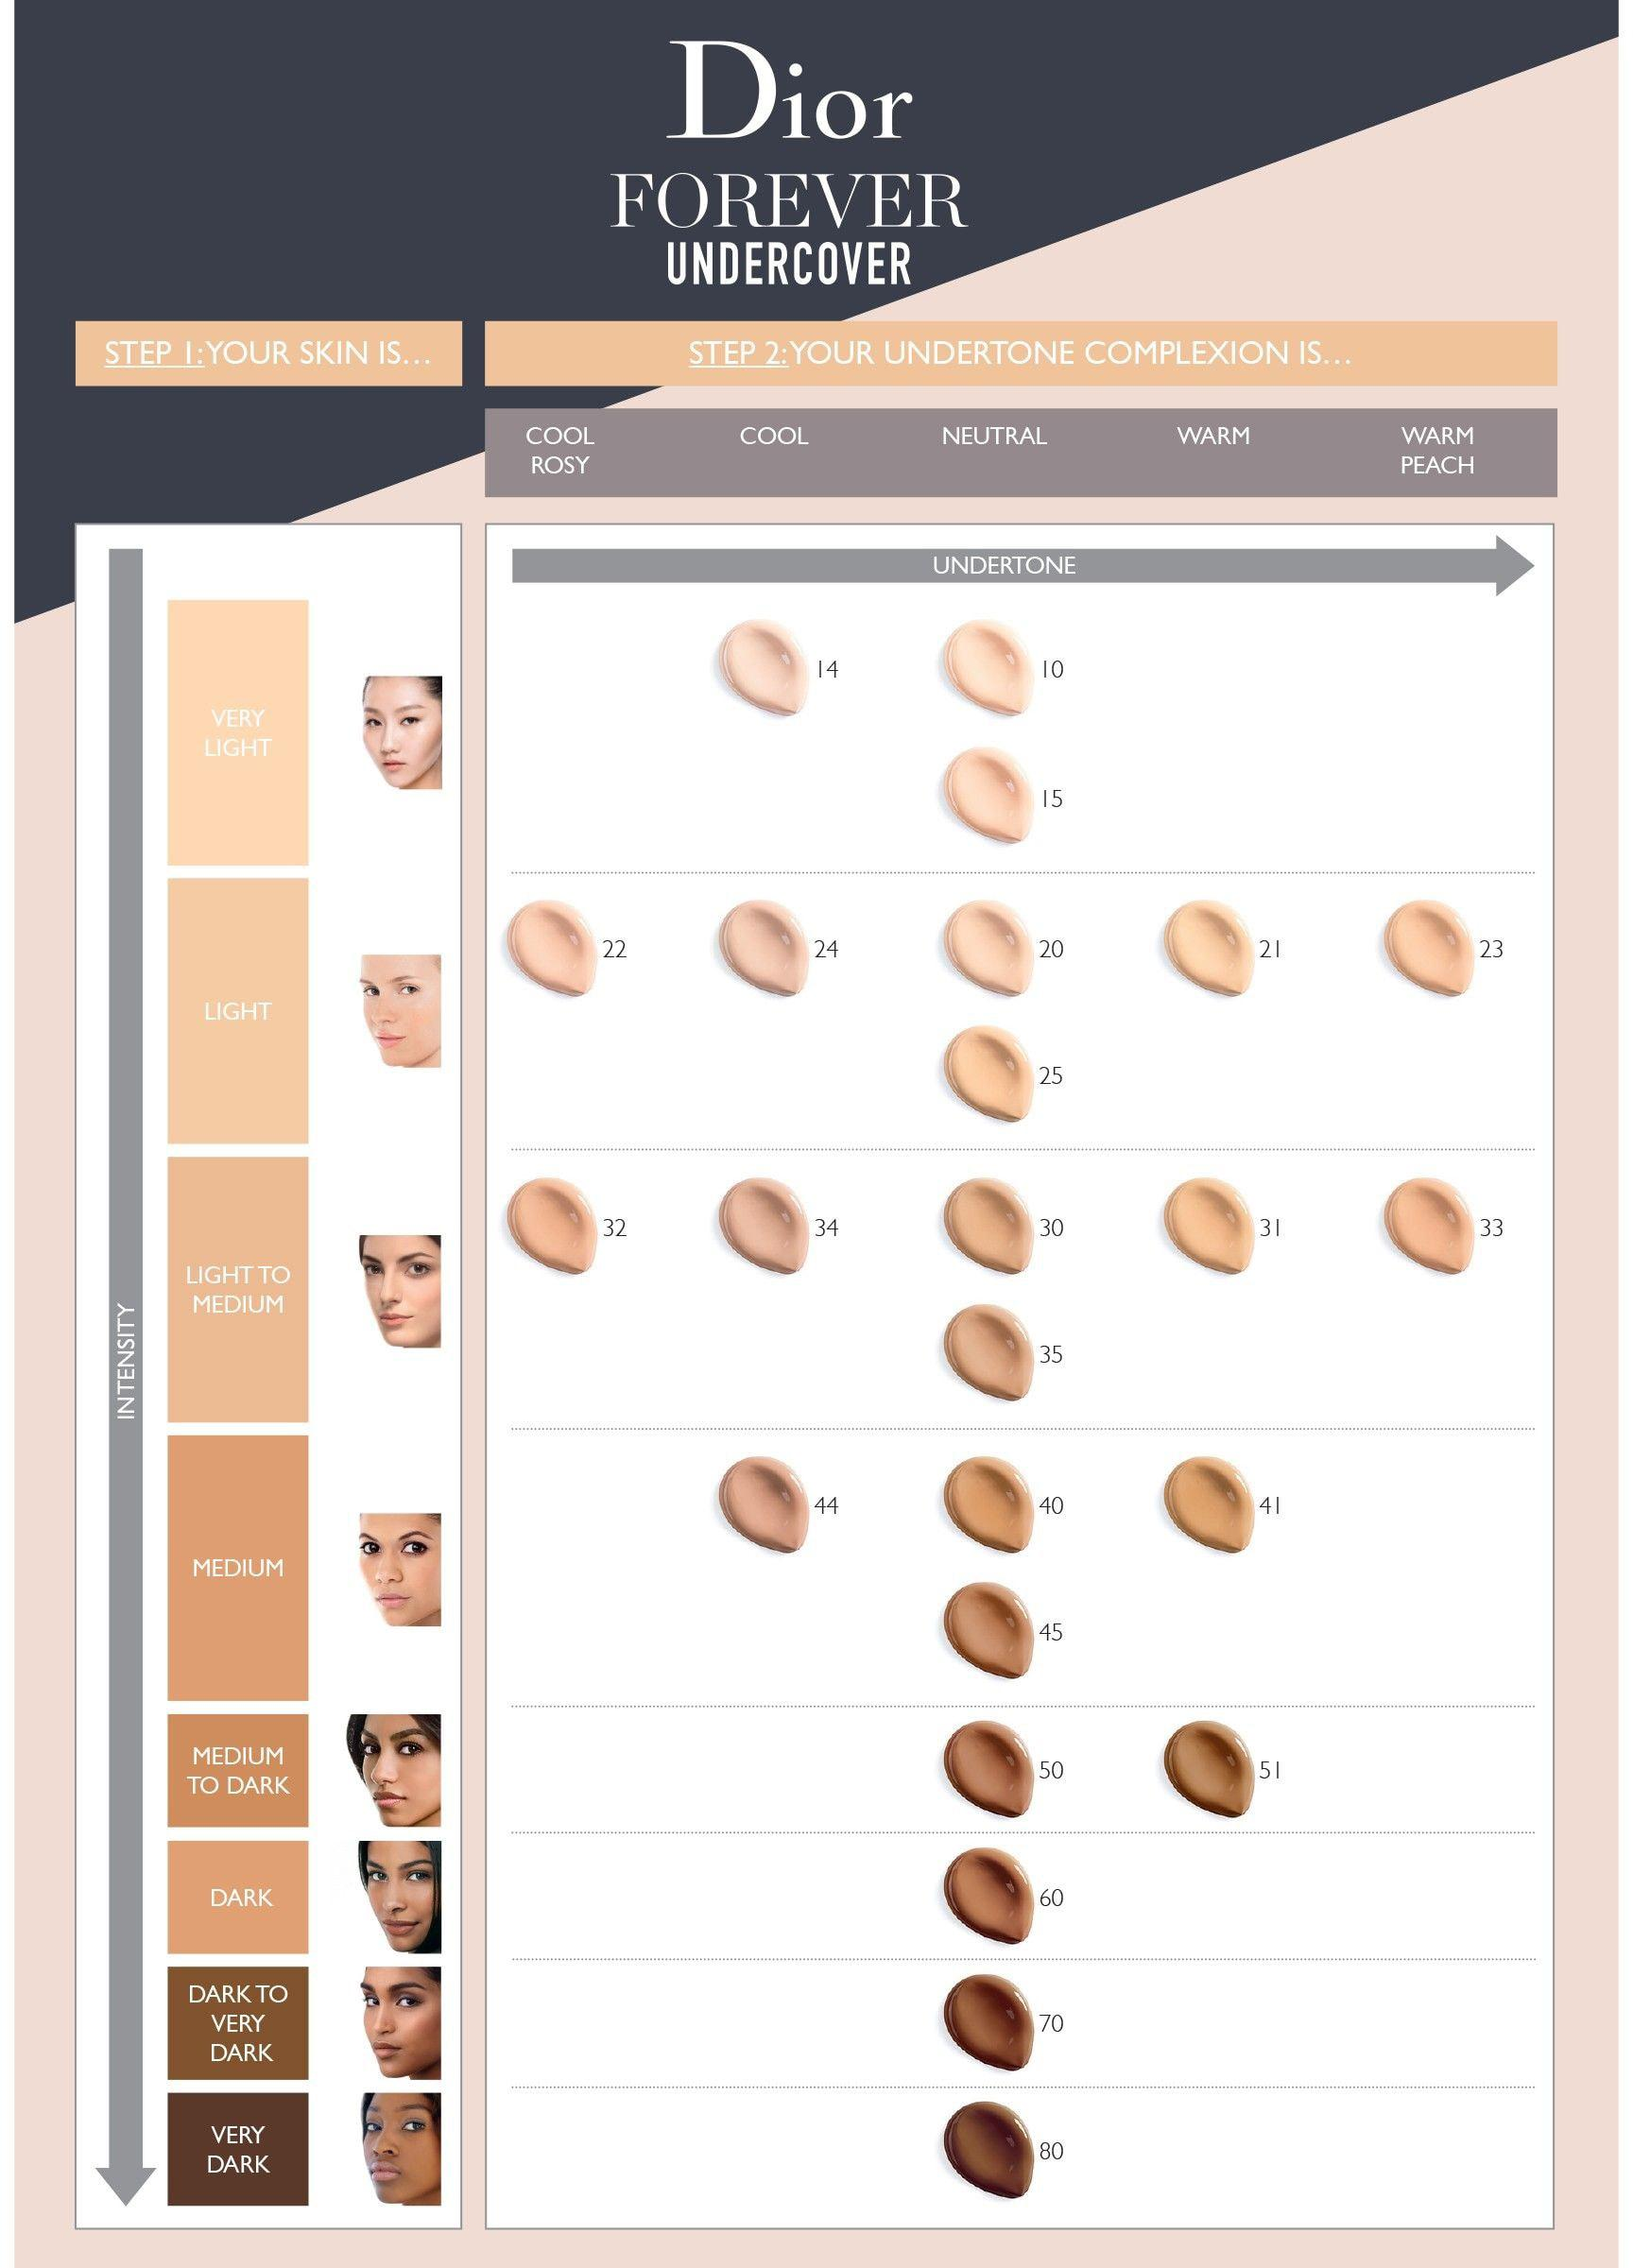 Dior Skin Forever Undercover Foundation 015 Tender Beige 1.3 Oz/ 40 Ml